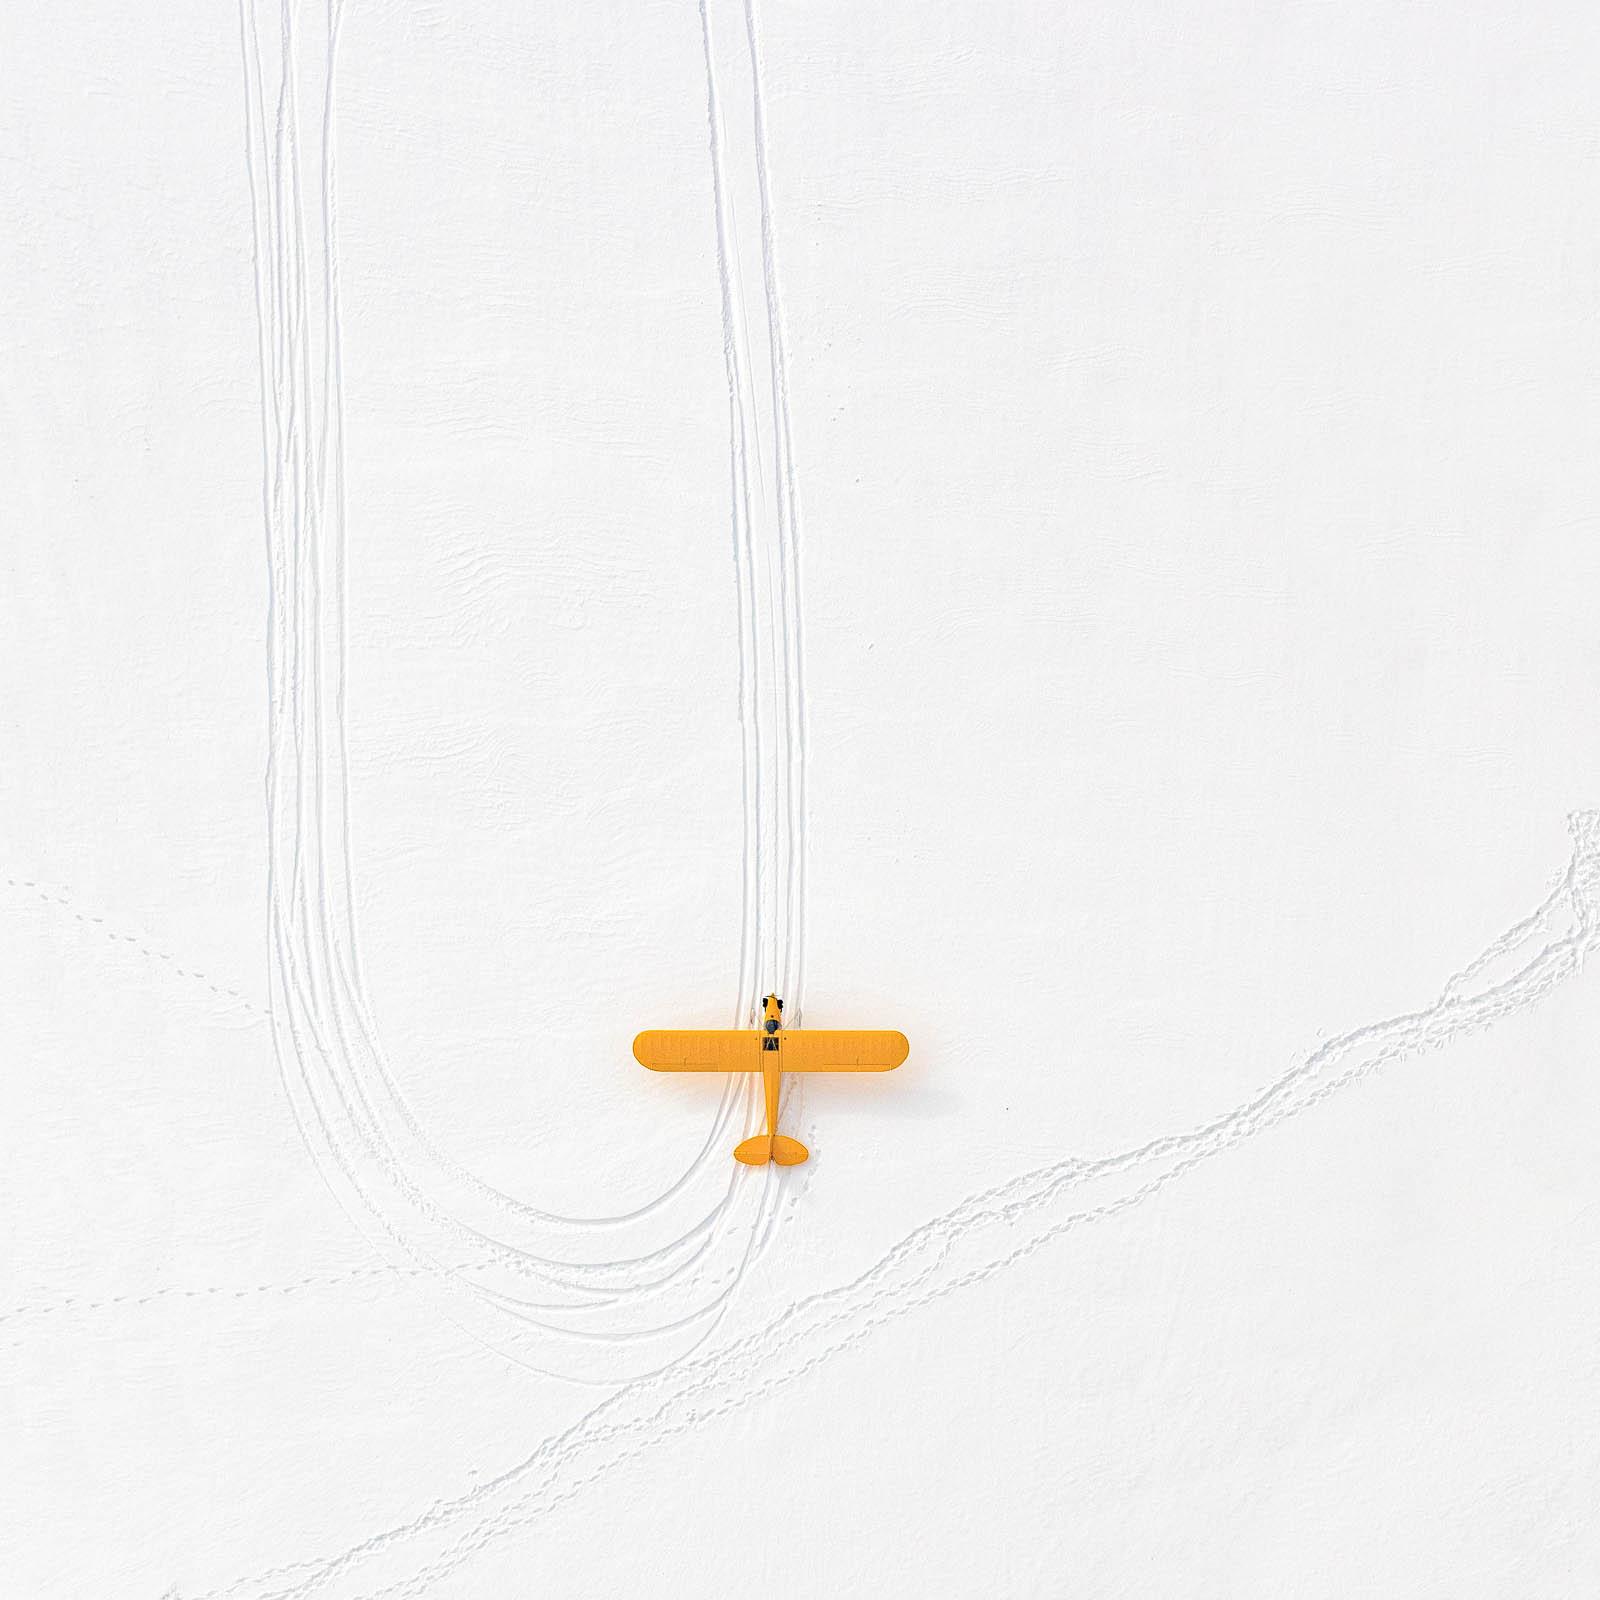 02 Yellow Plane